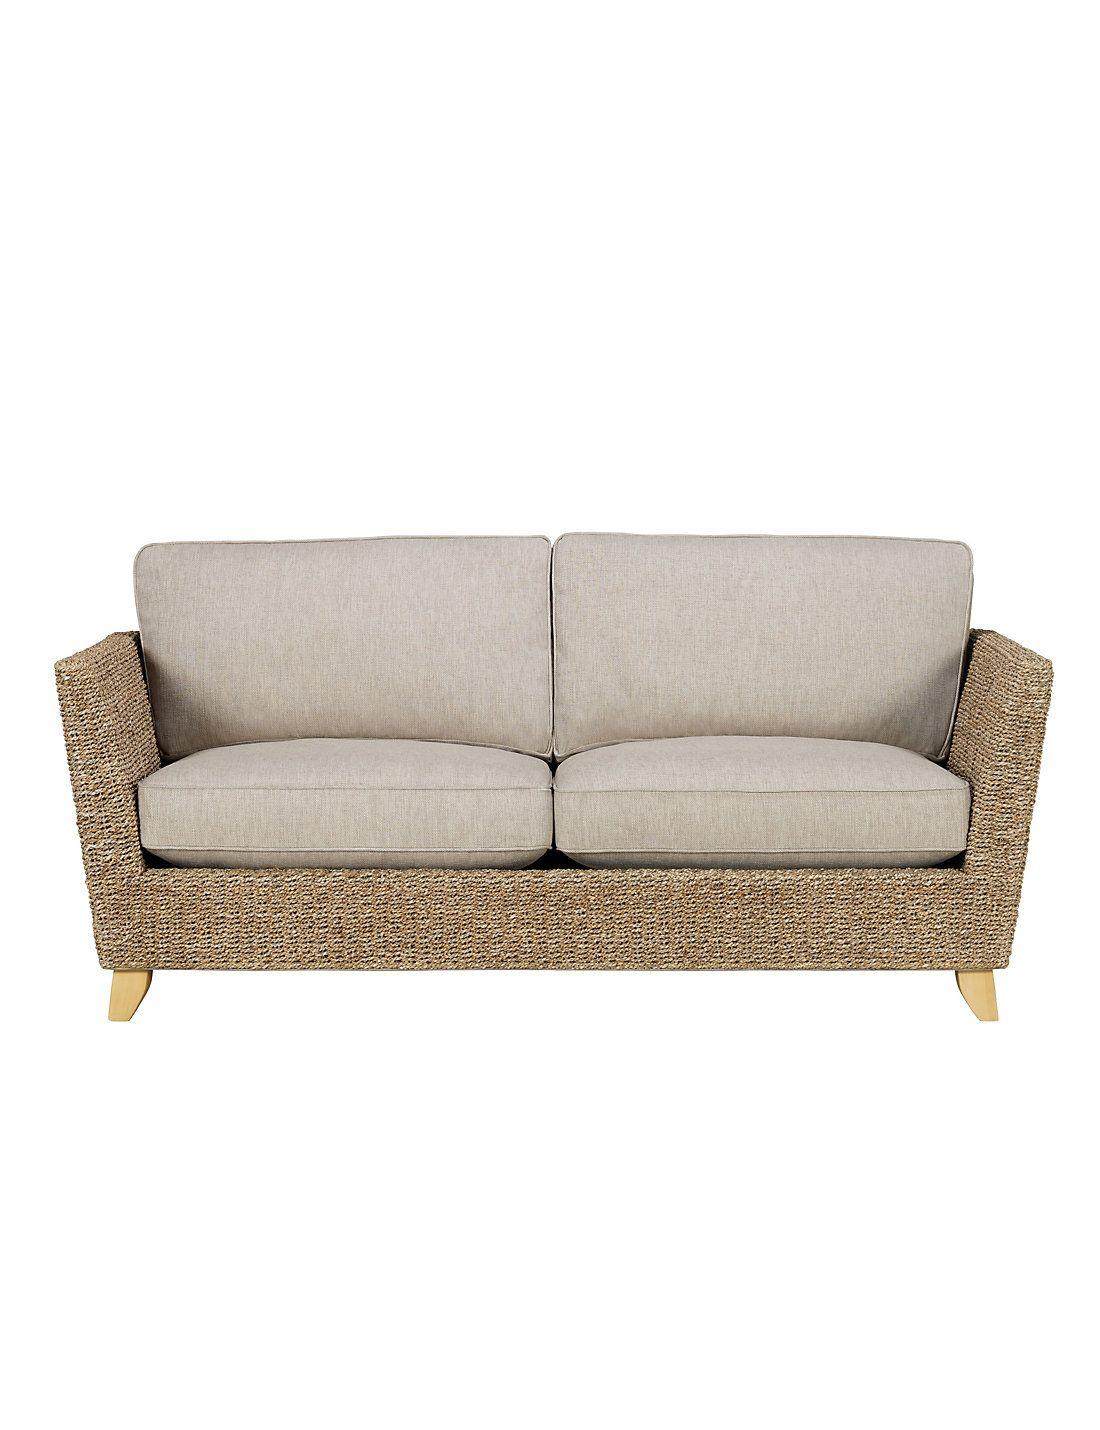 Bermuda Medium Sofa - M&S | Sofa, Fabulous sofa, Outdoor sofa